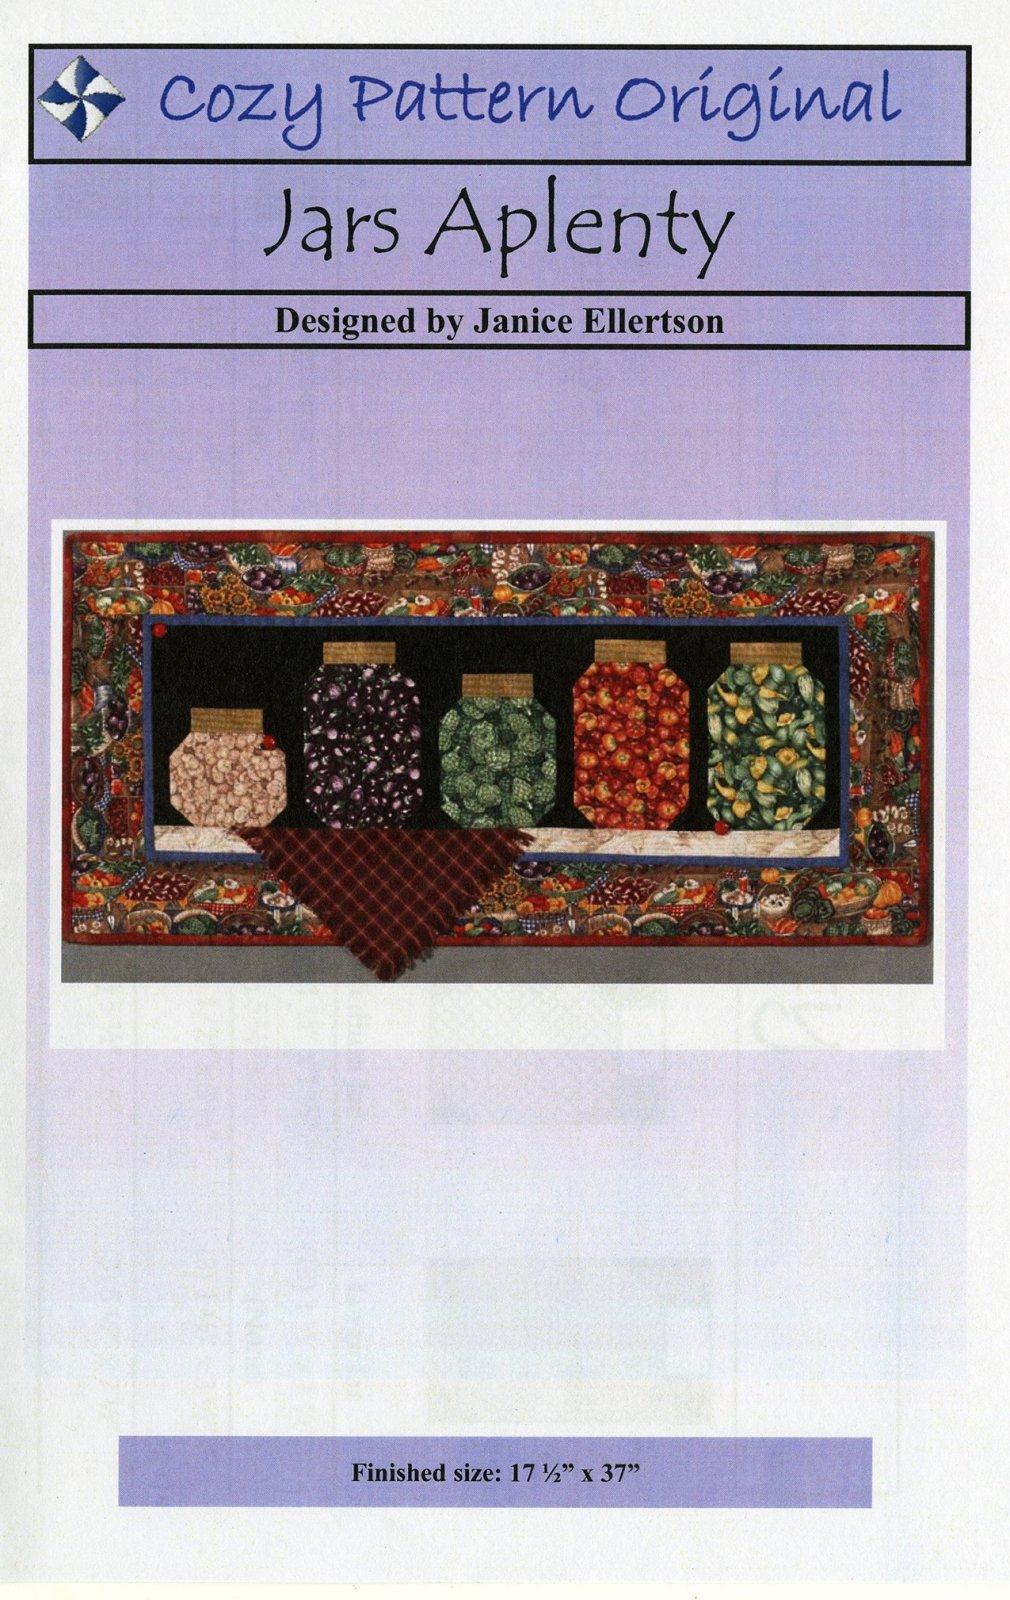 Cozy Original - Jars Aplenty